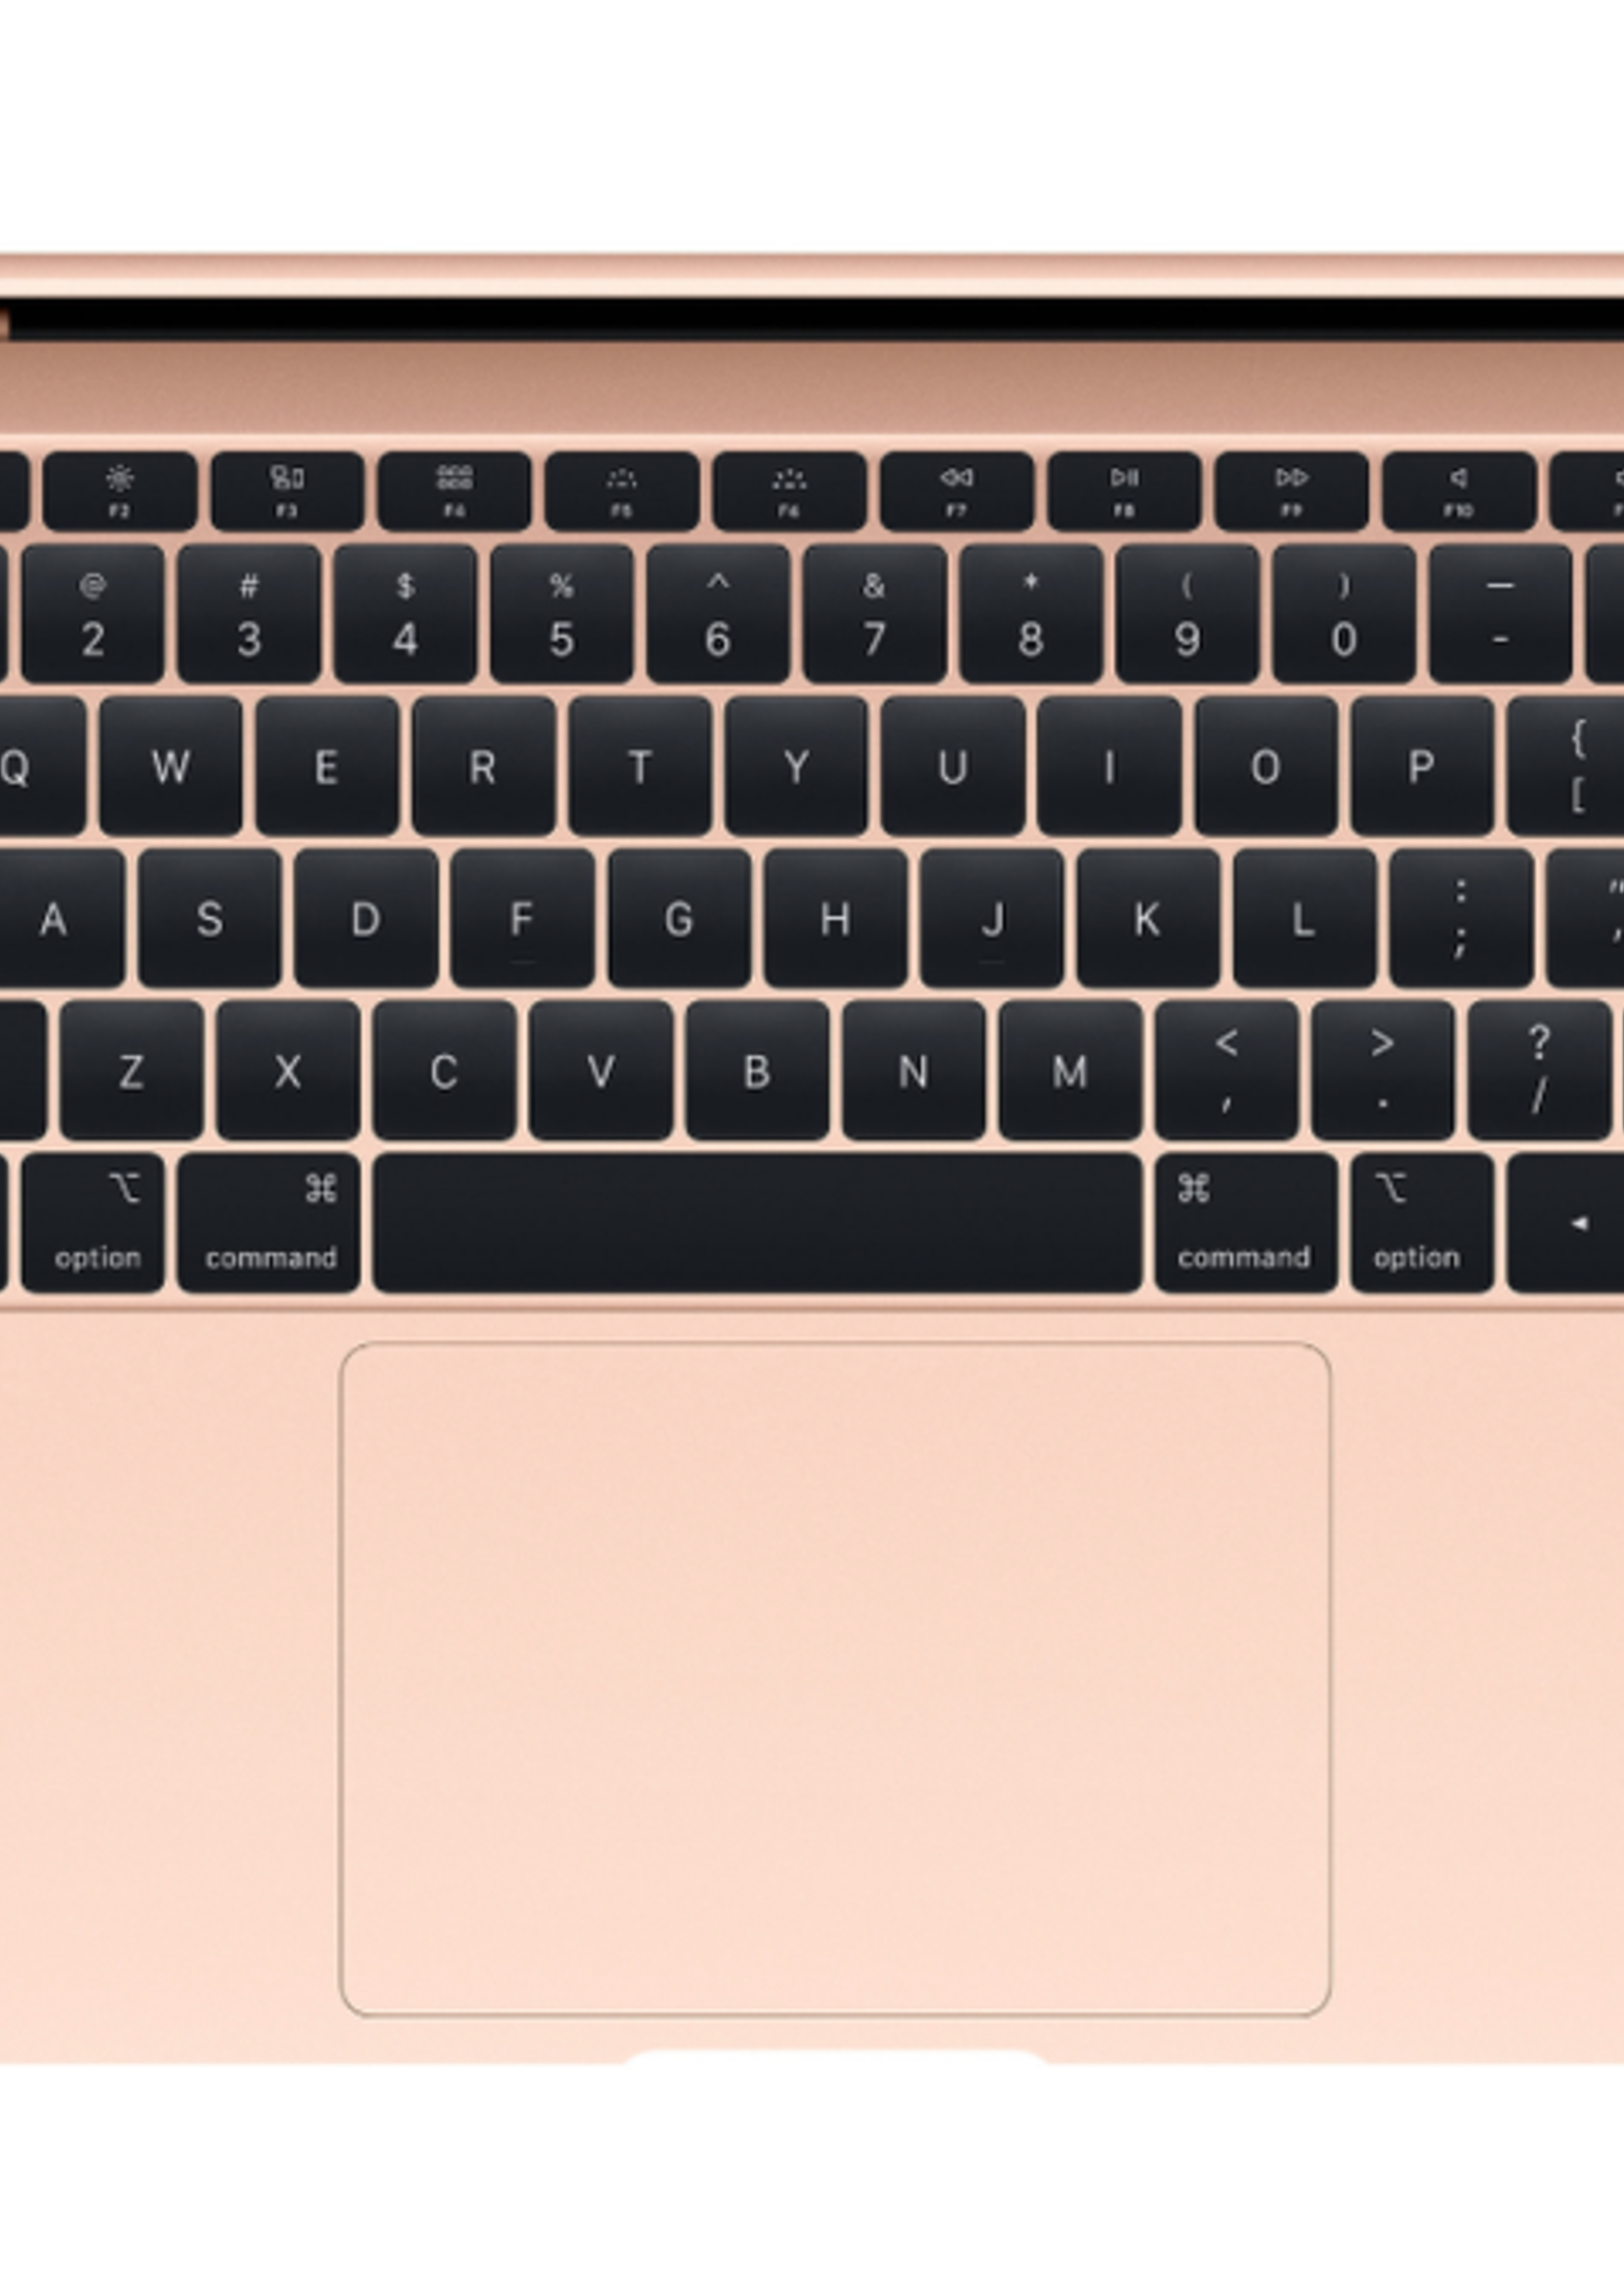 "13"" MacBook Air -  256GB - Gold - 2018"